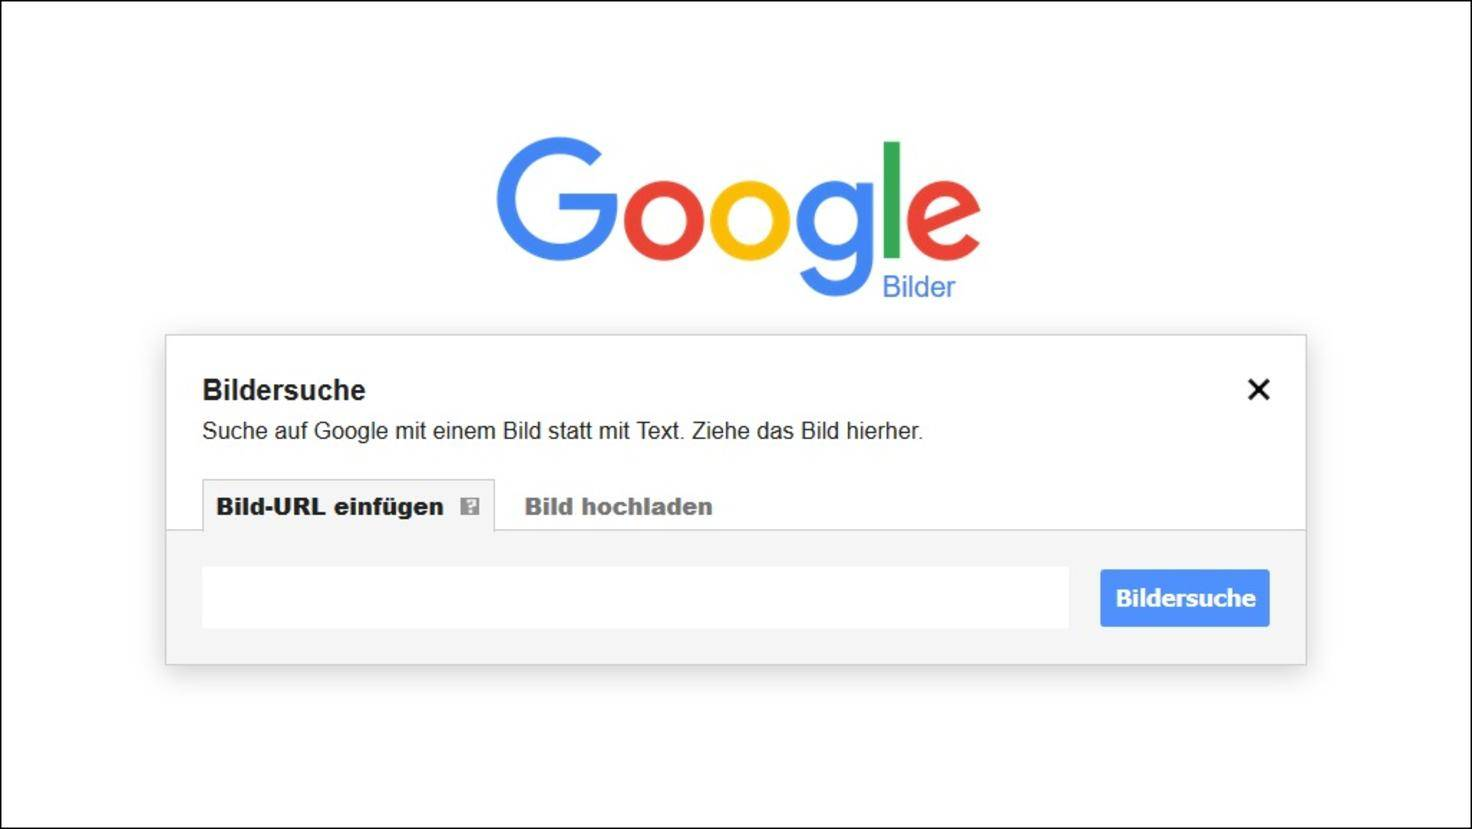 Bildersuche-Google